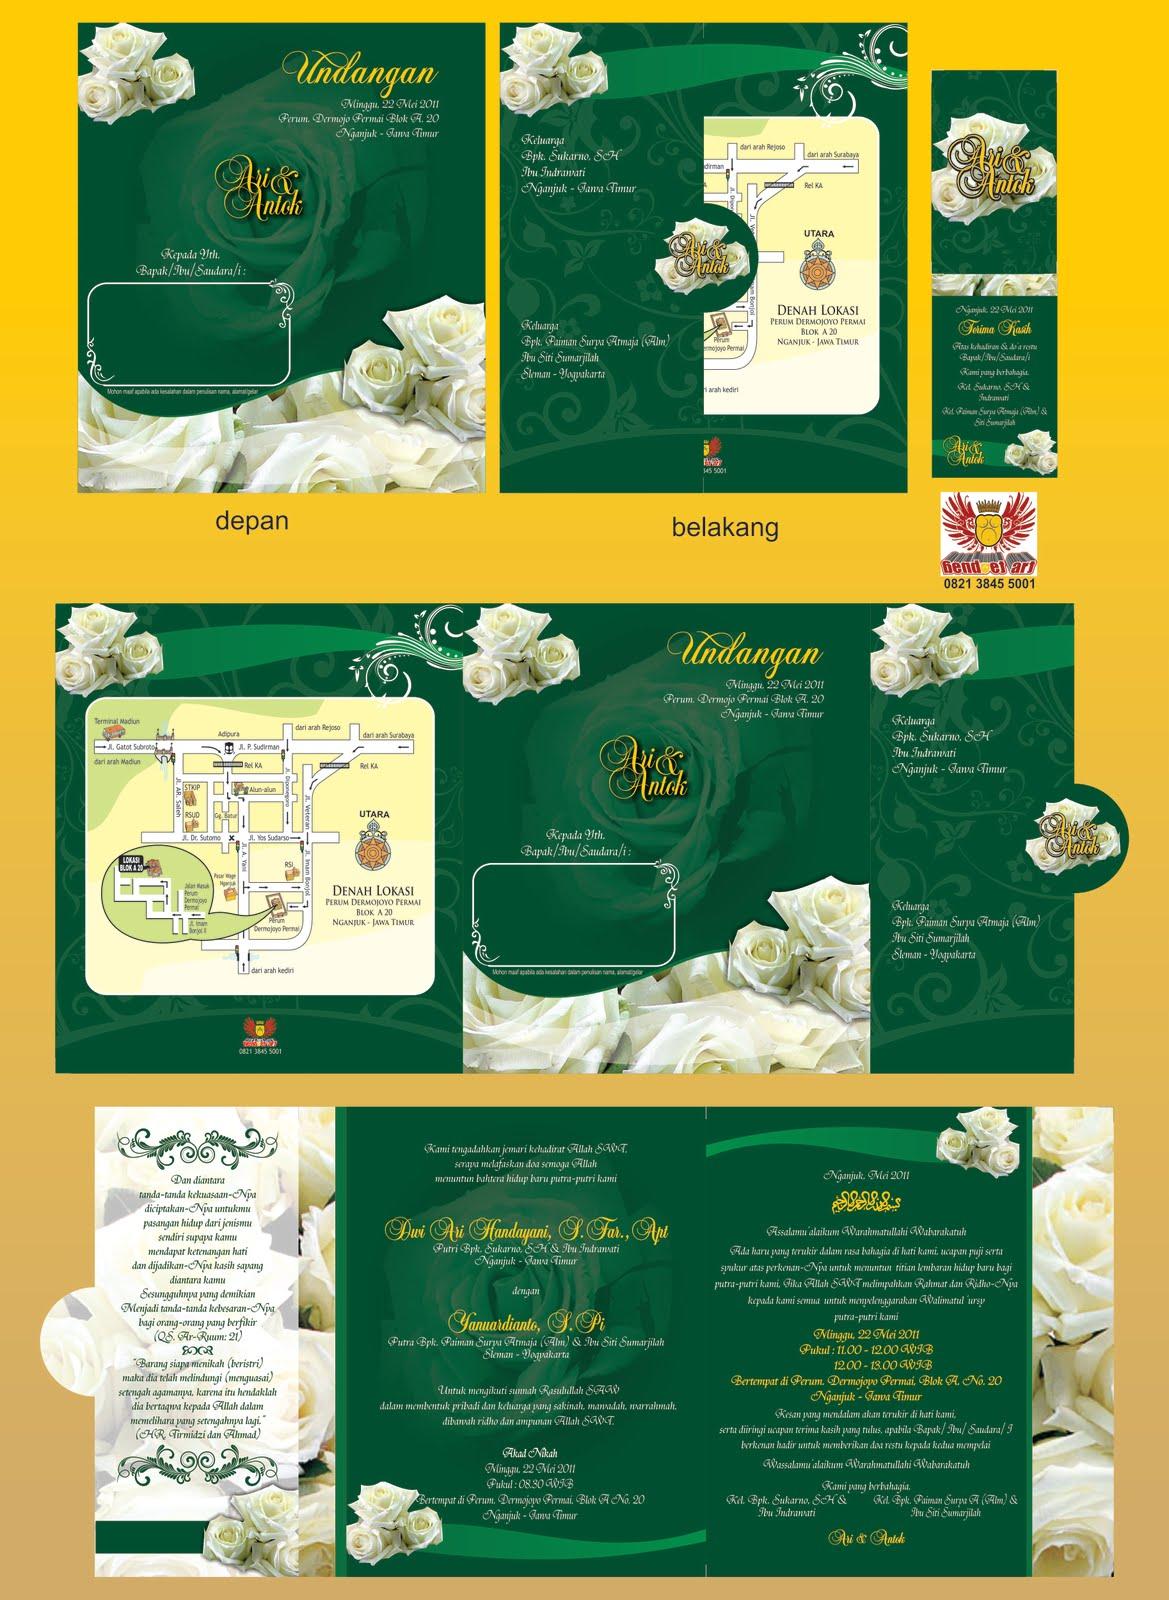 Undangan dengan motif bunga mawar putih, dengan bacground hijau